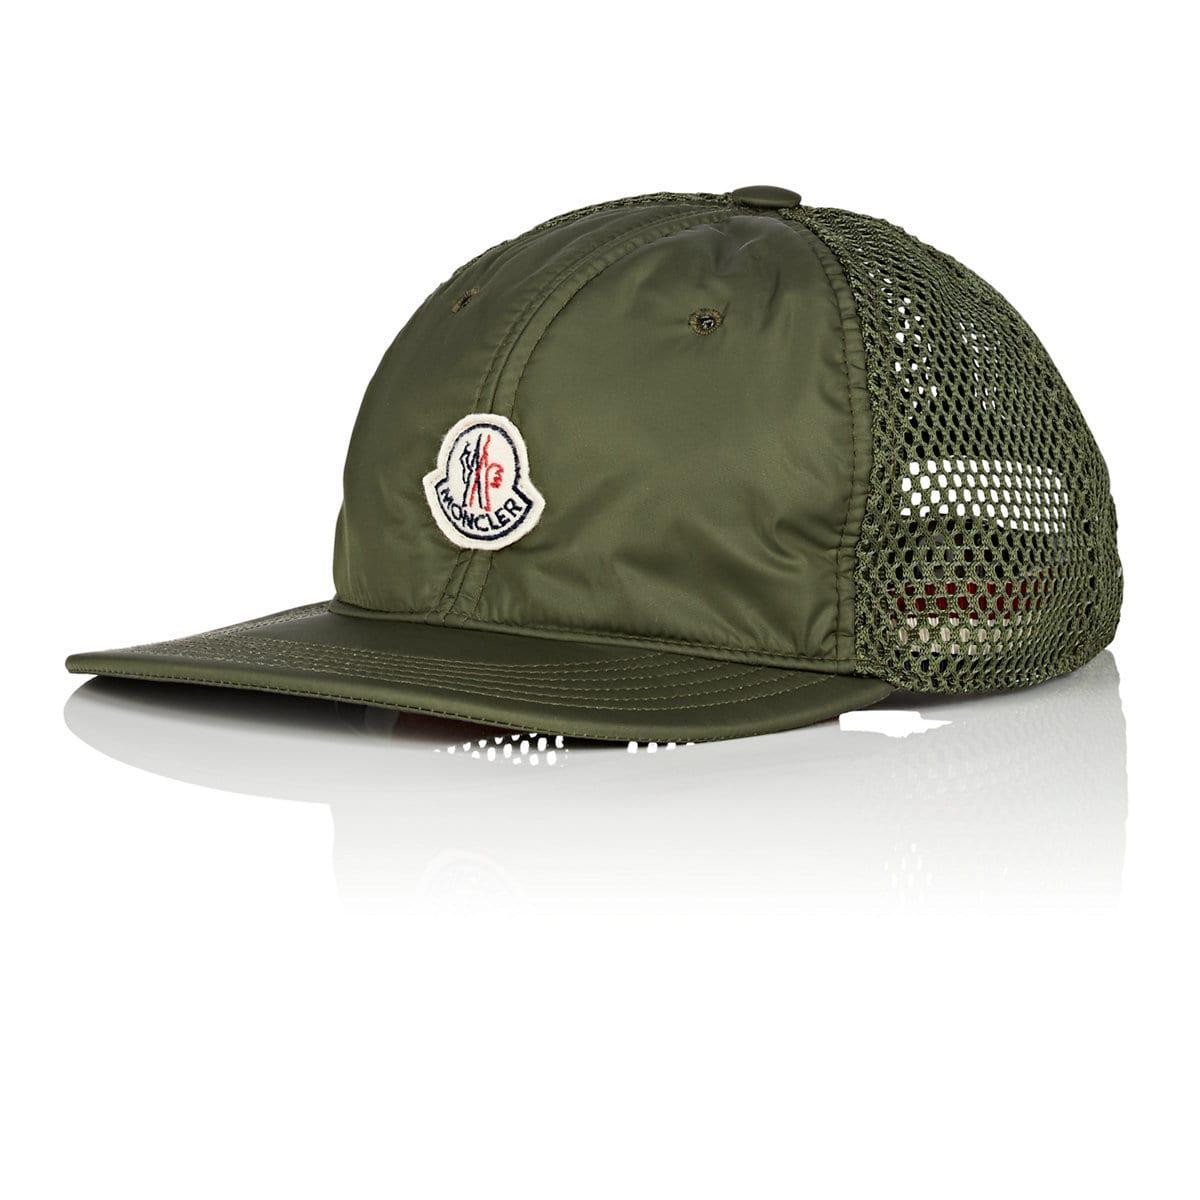 00cc2a772dc Lyst - Moncler Logo Mesh-back Trucker Hat in Green for Men